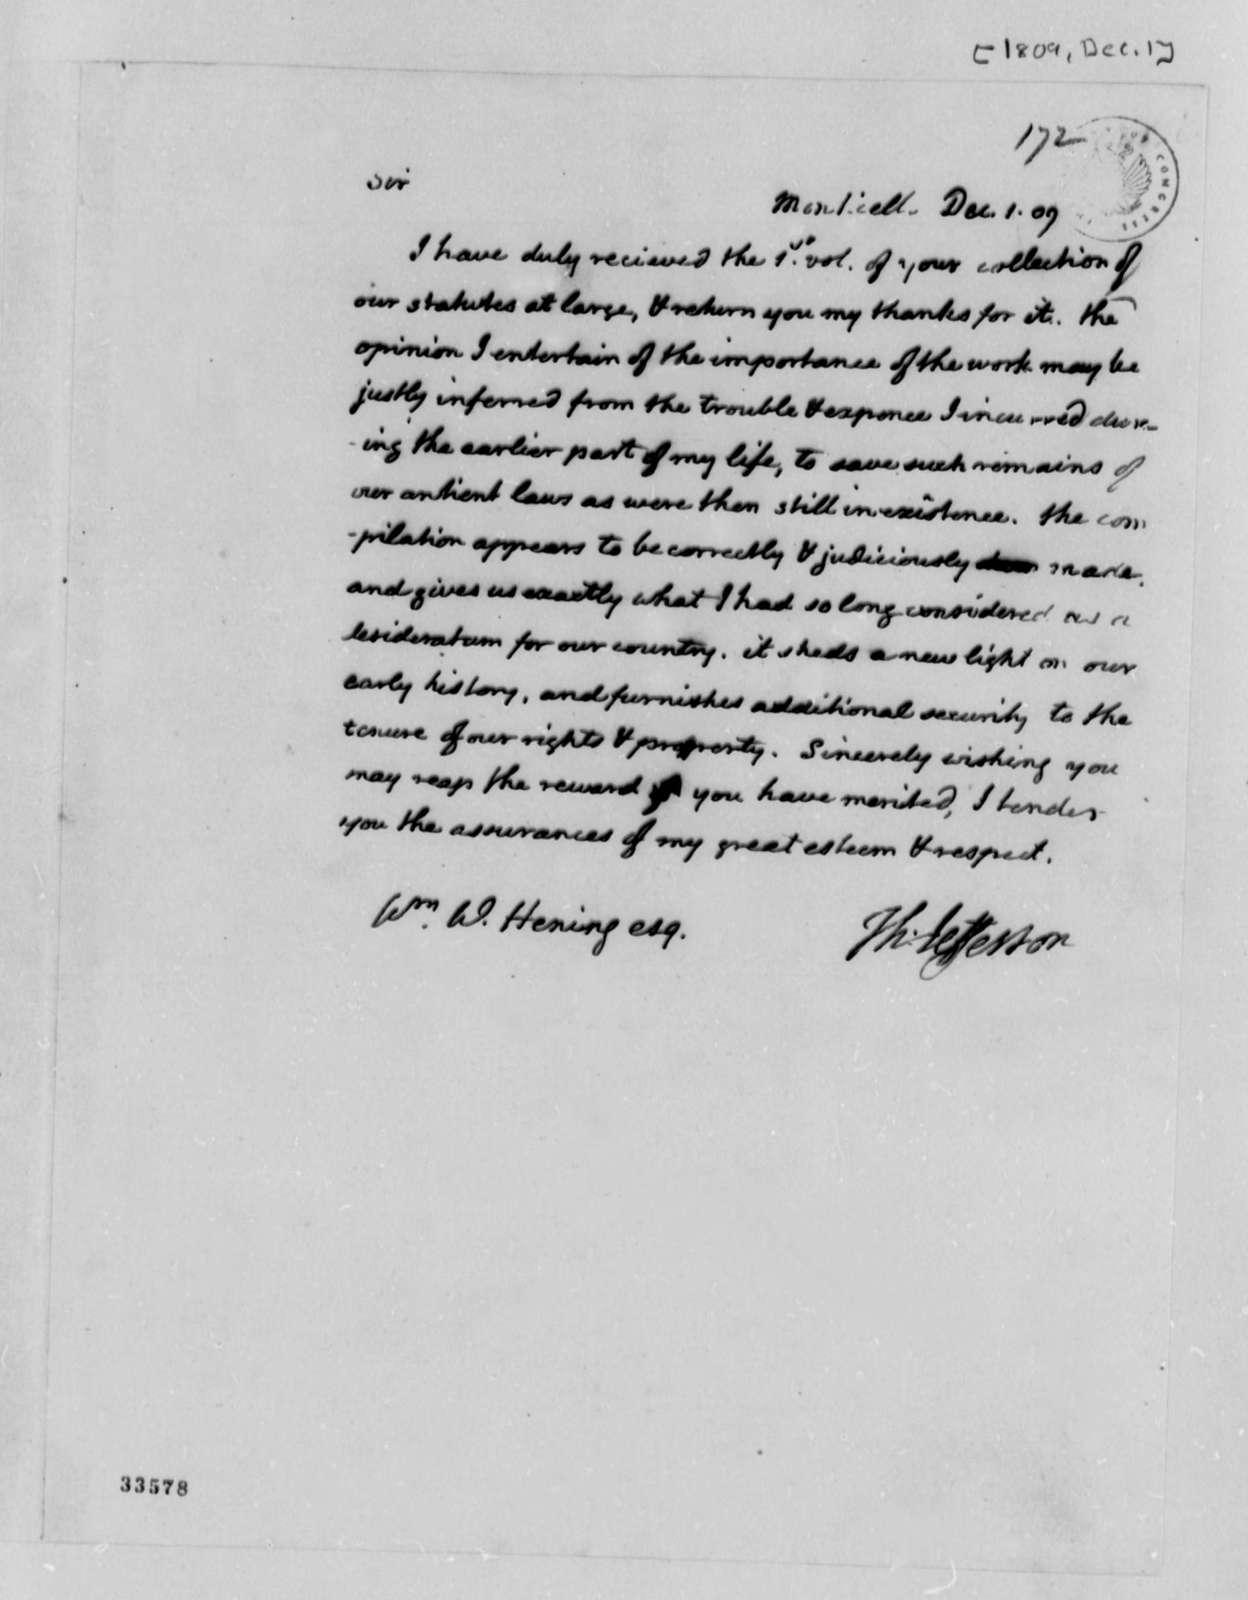 Thomas Jefferson to William Waller Hening, December 1, 1809